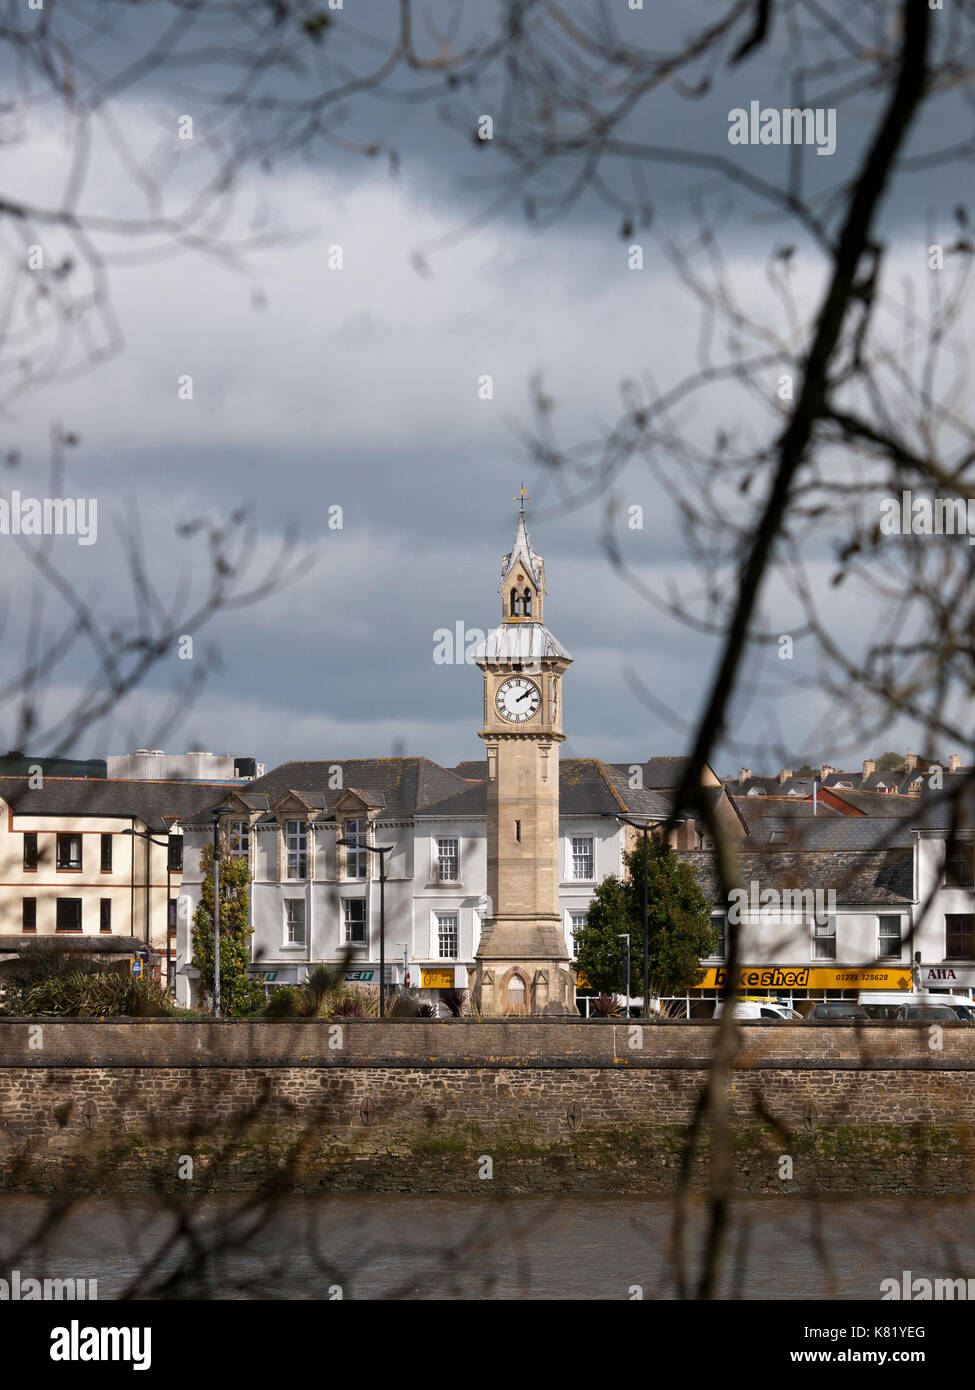 Prince Albert Memorial Clock, in Barnstaple, Devon, UK, viewed from across the River Taw - Stock Image